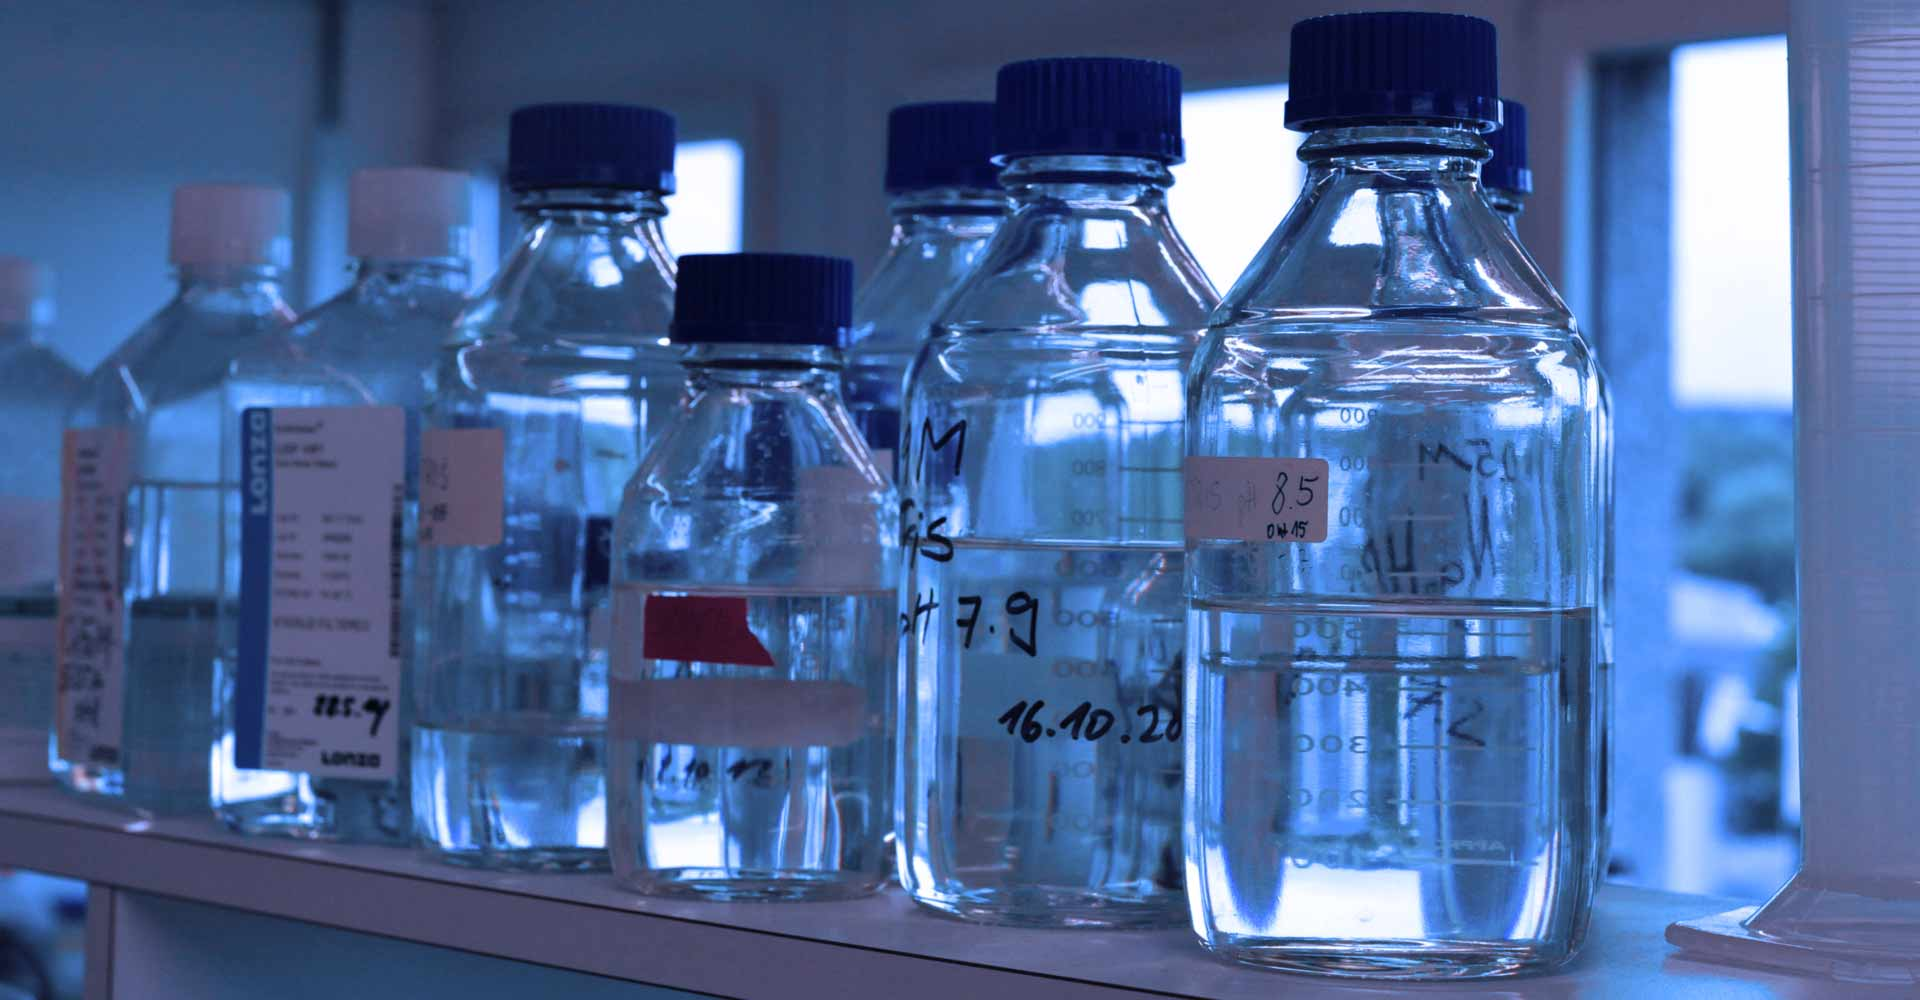 Chemicals for Molecular Biology by PolyGene